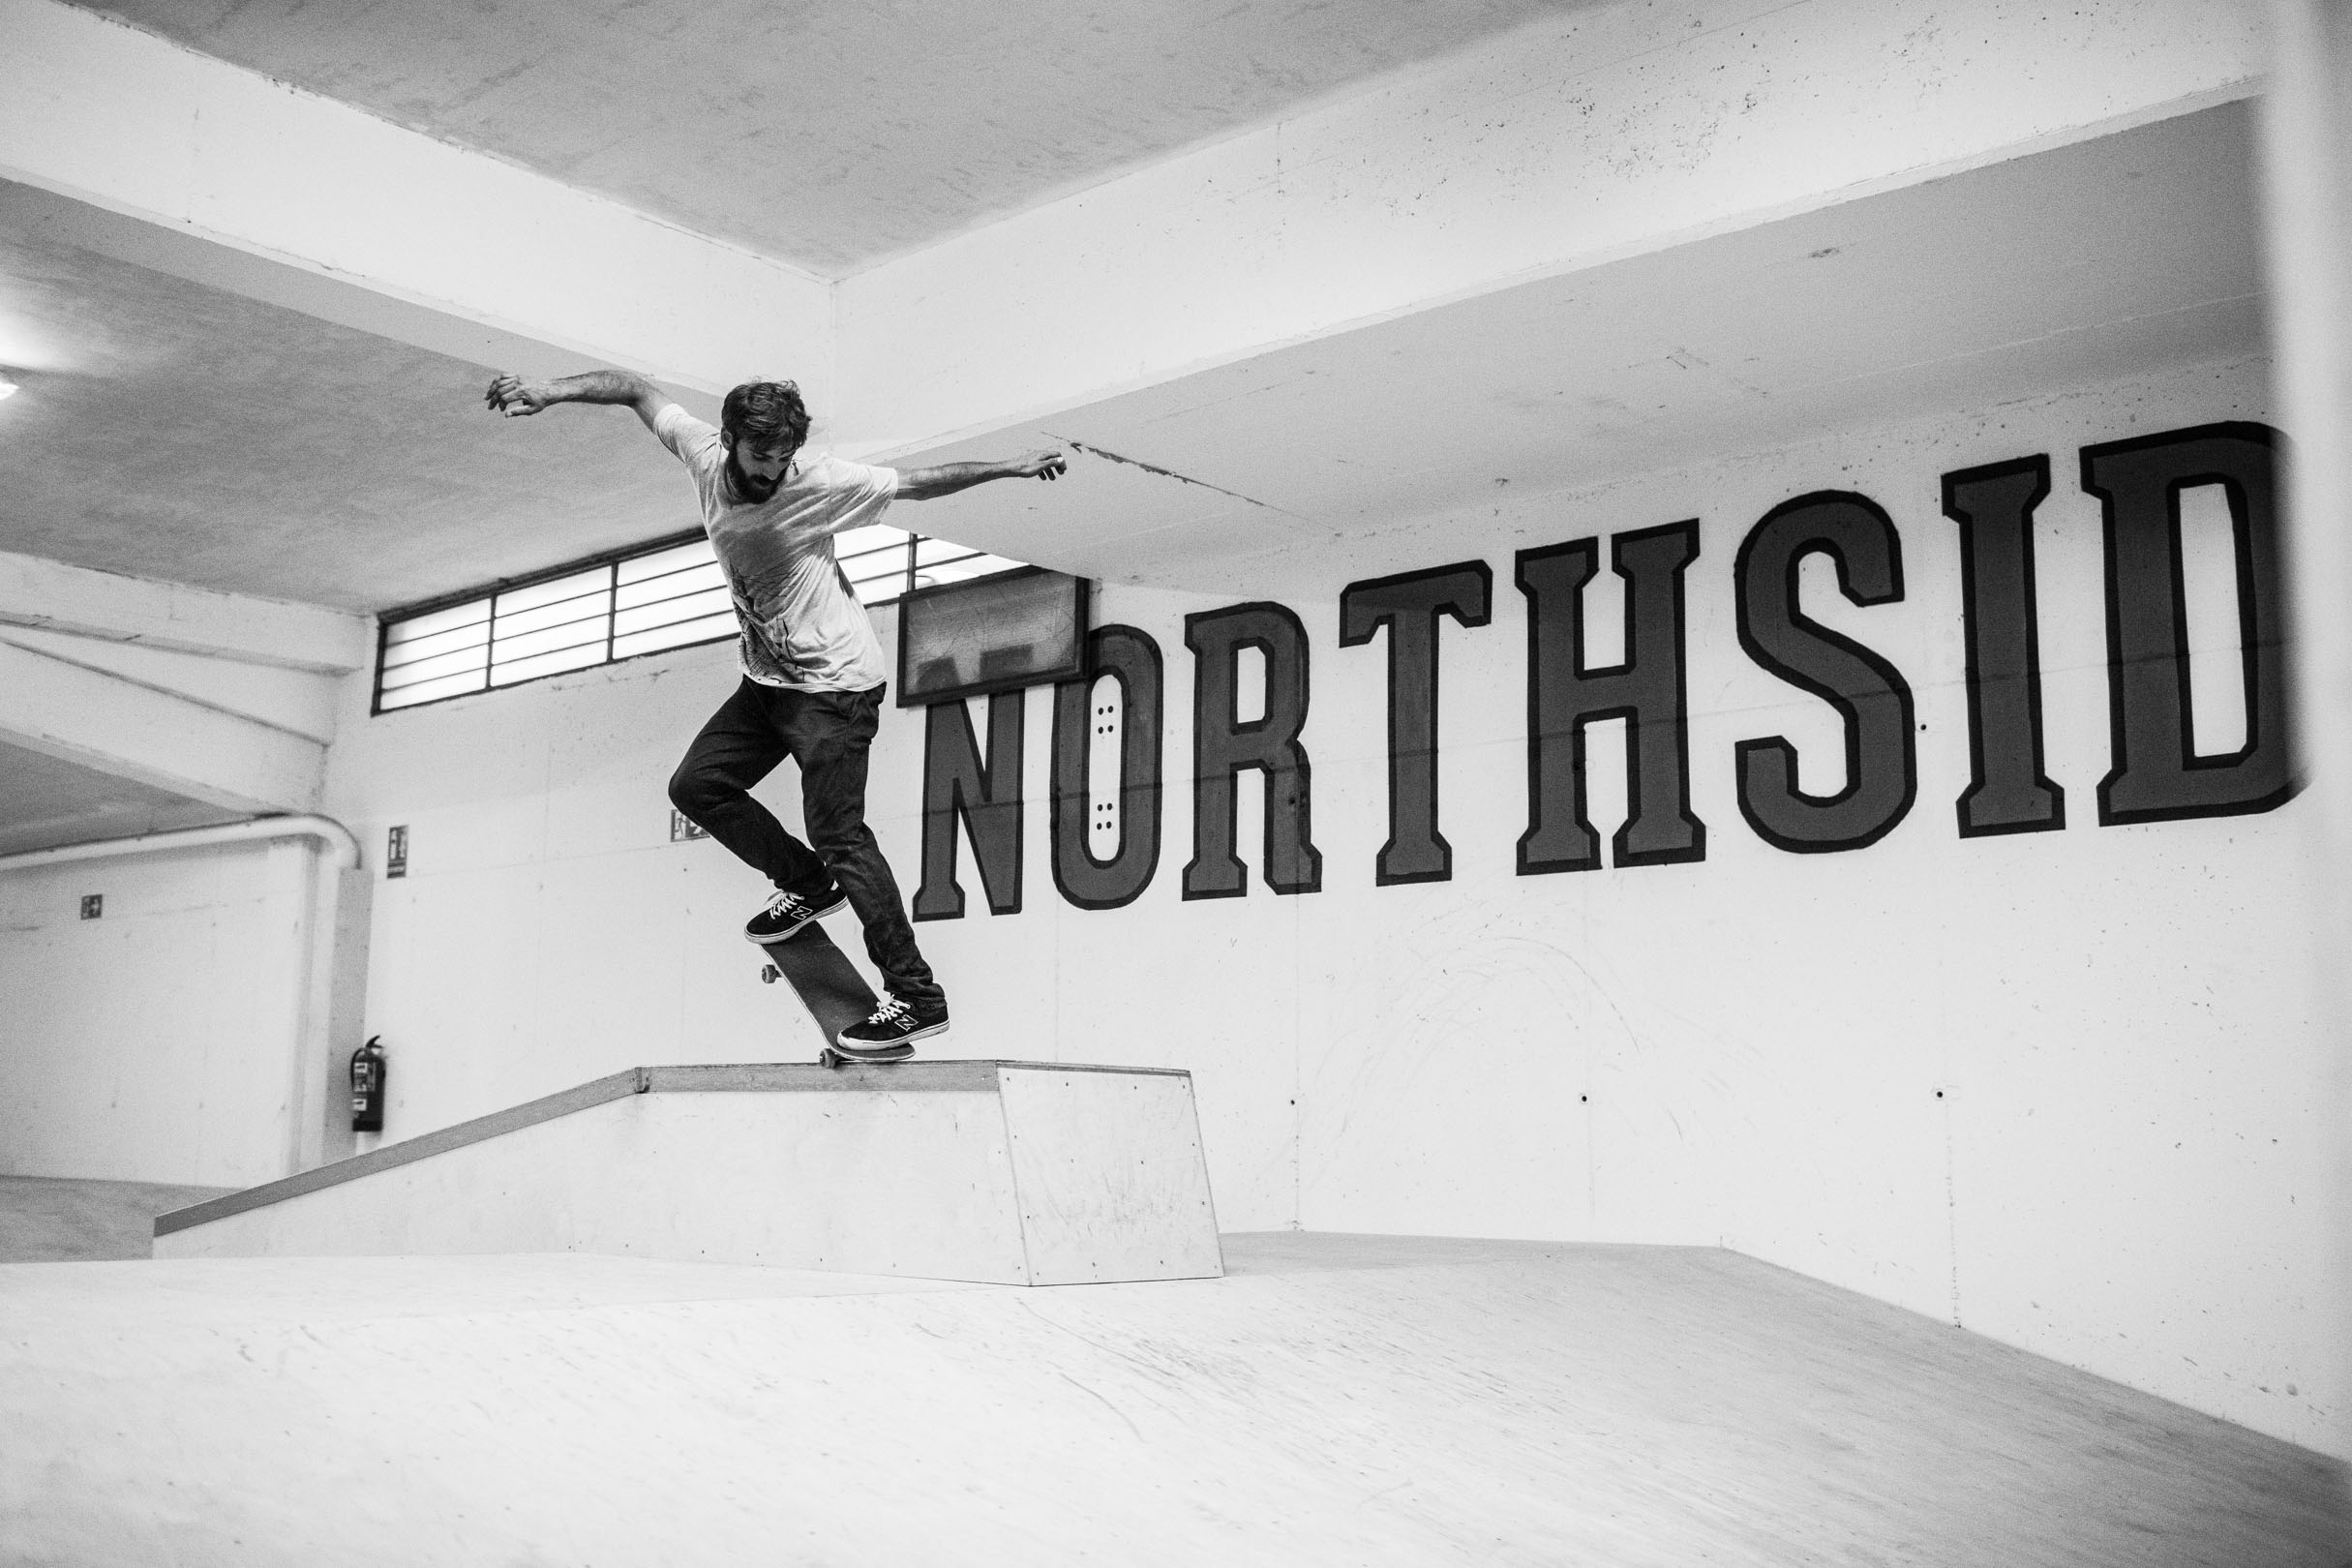 coruna-fotografia-skate-13.jpg